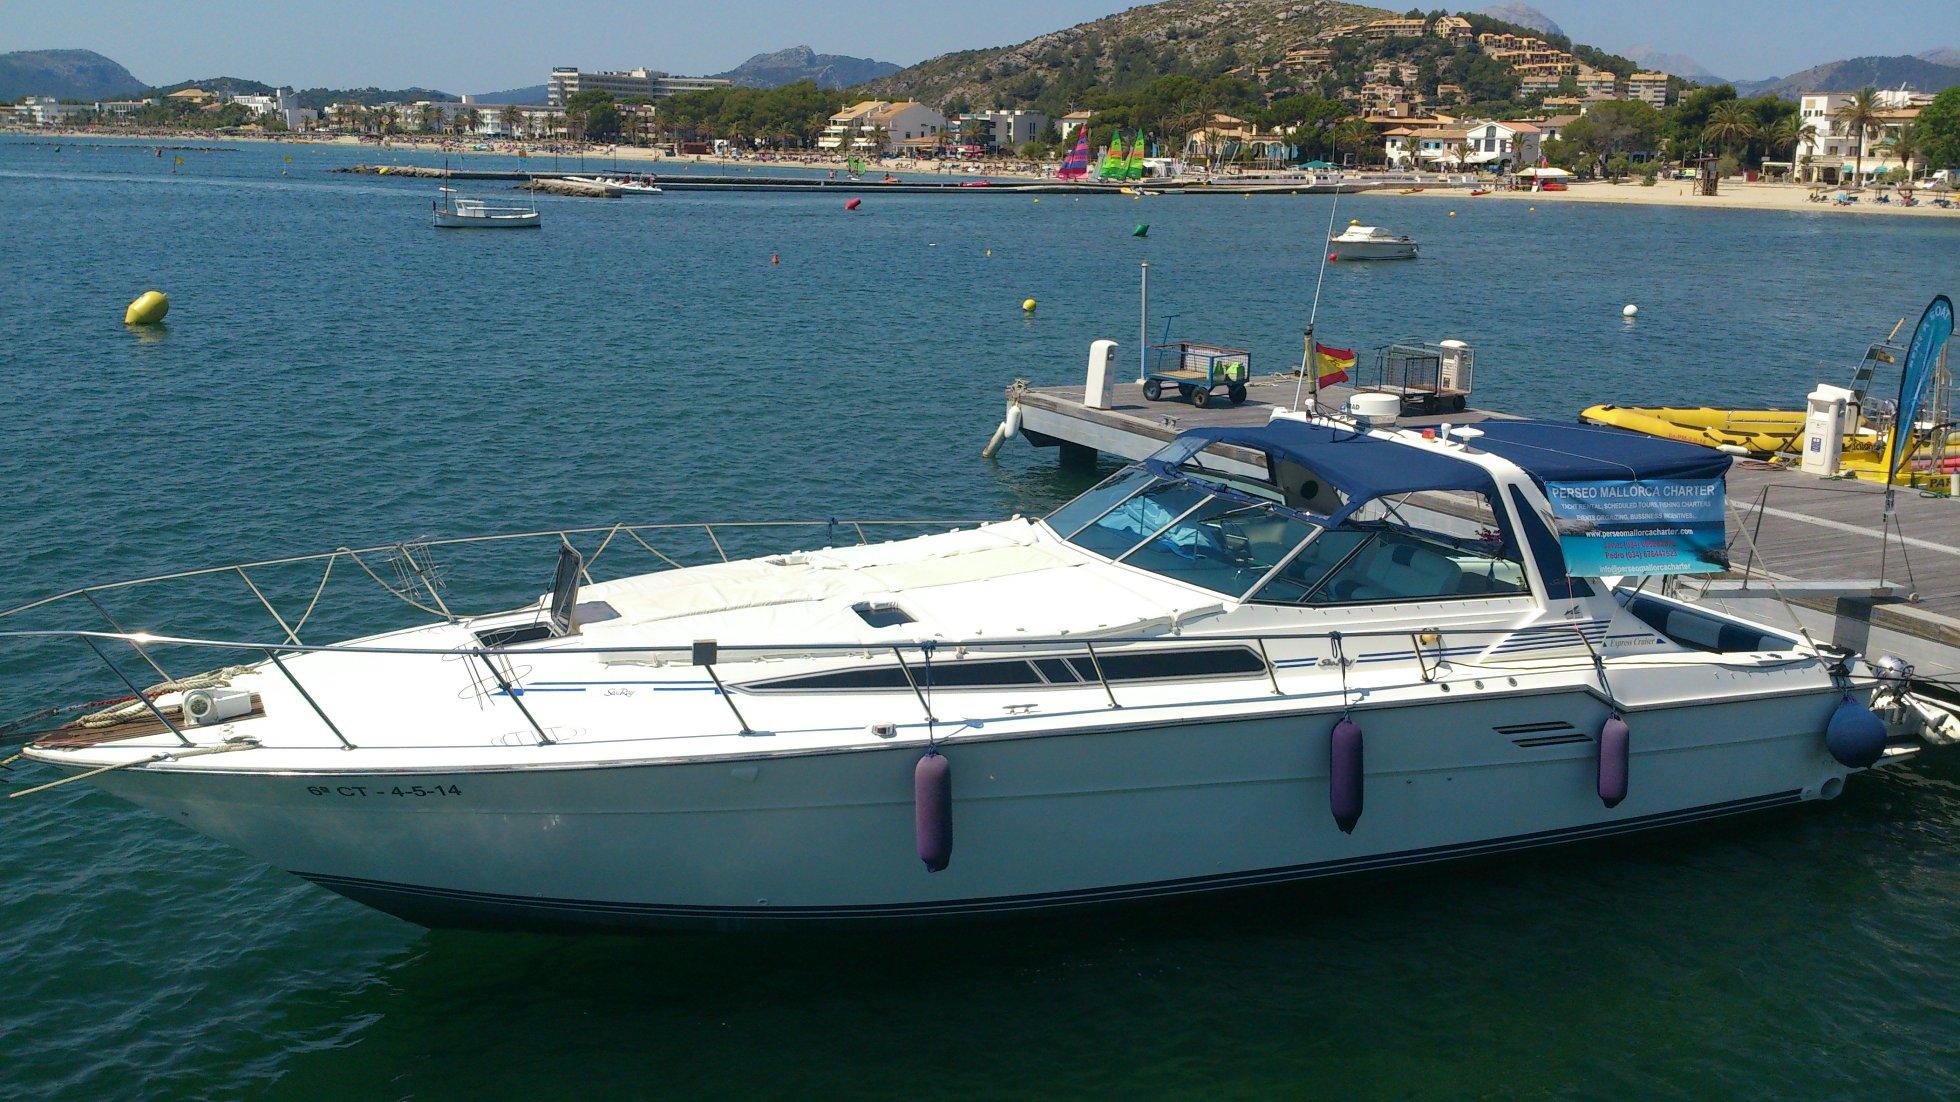 offshore mallorca sea ray 460 15m motoryacht 9 personen. Black Bedroom Furniture Sets. Home Design Ideas